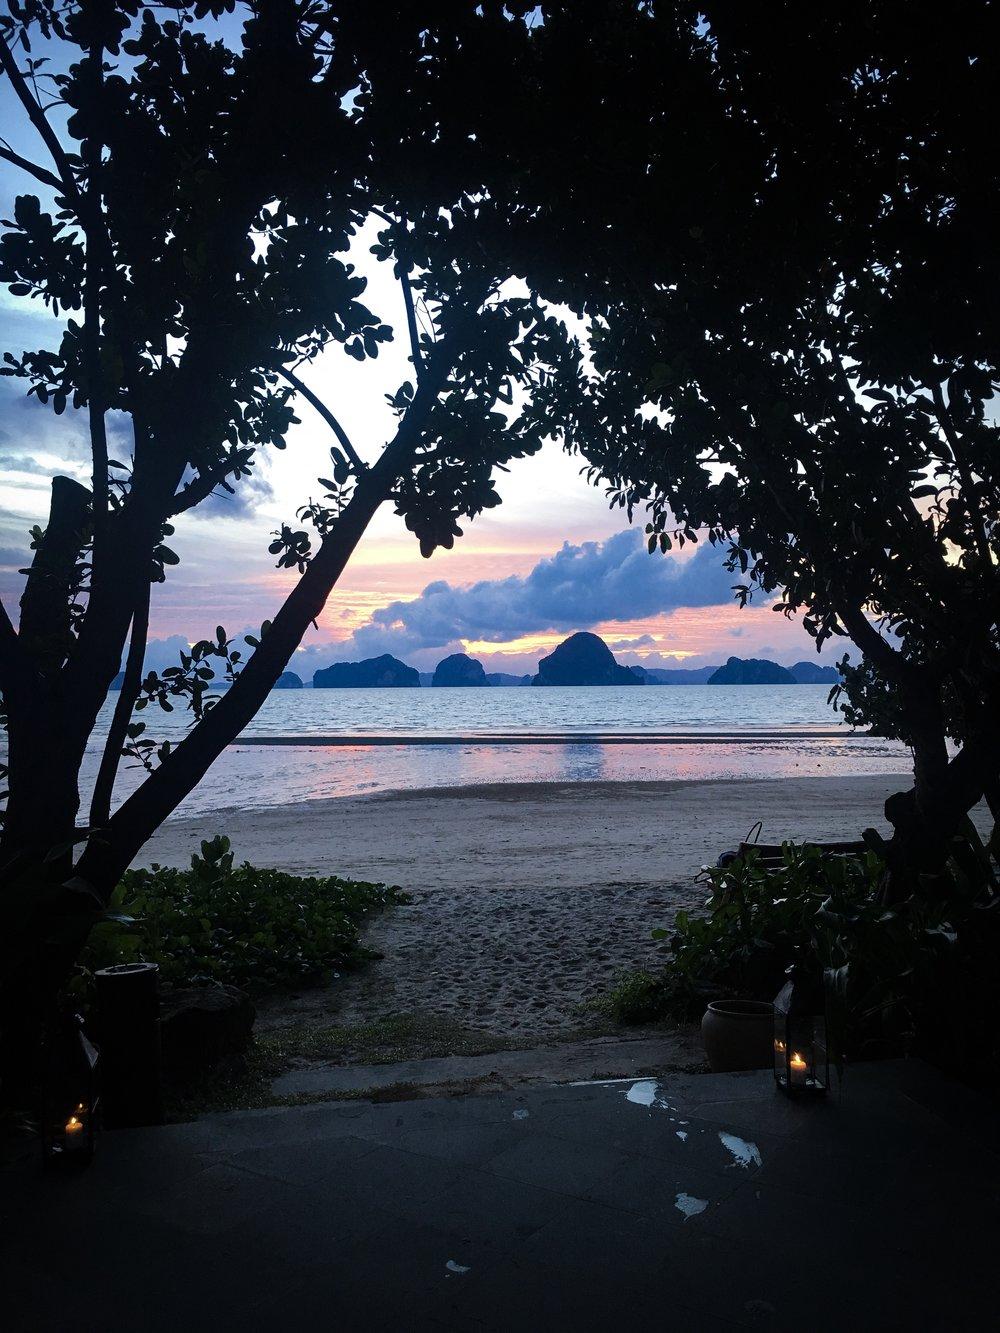 tubkaak-krabi-travel-blog.jpg